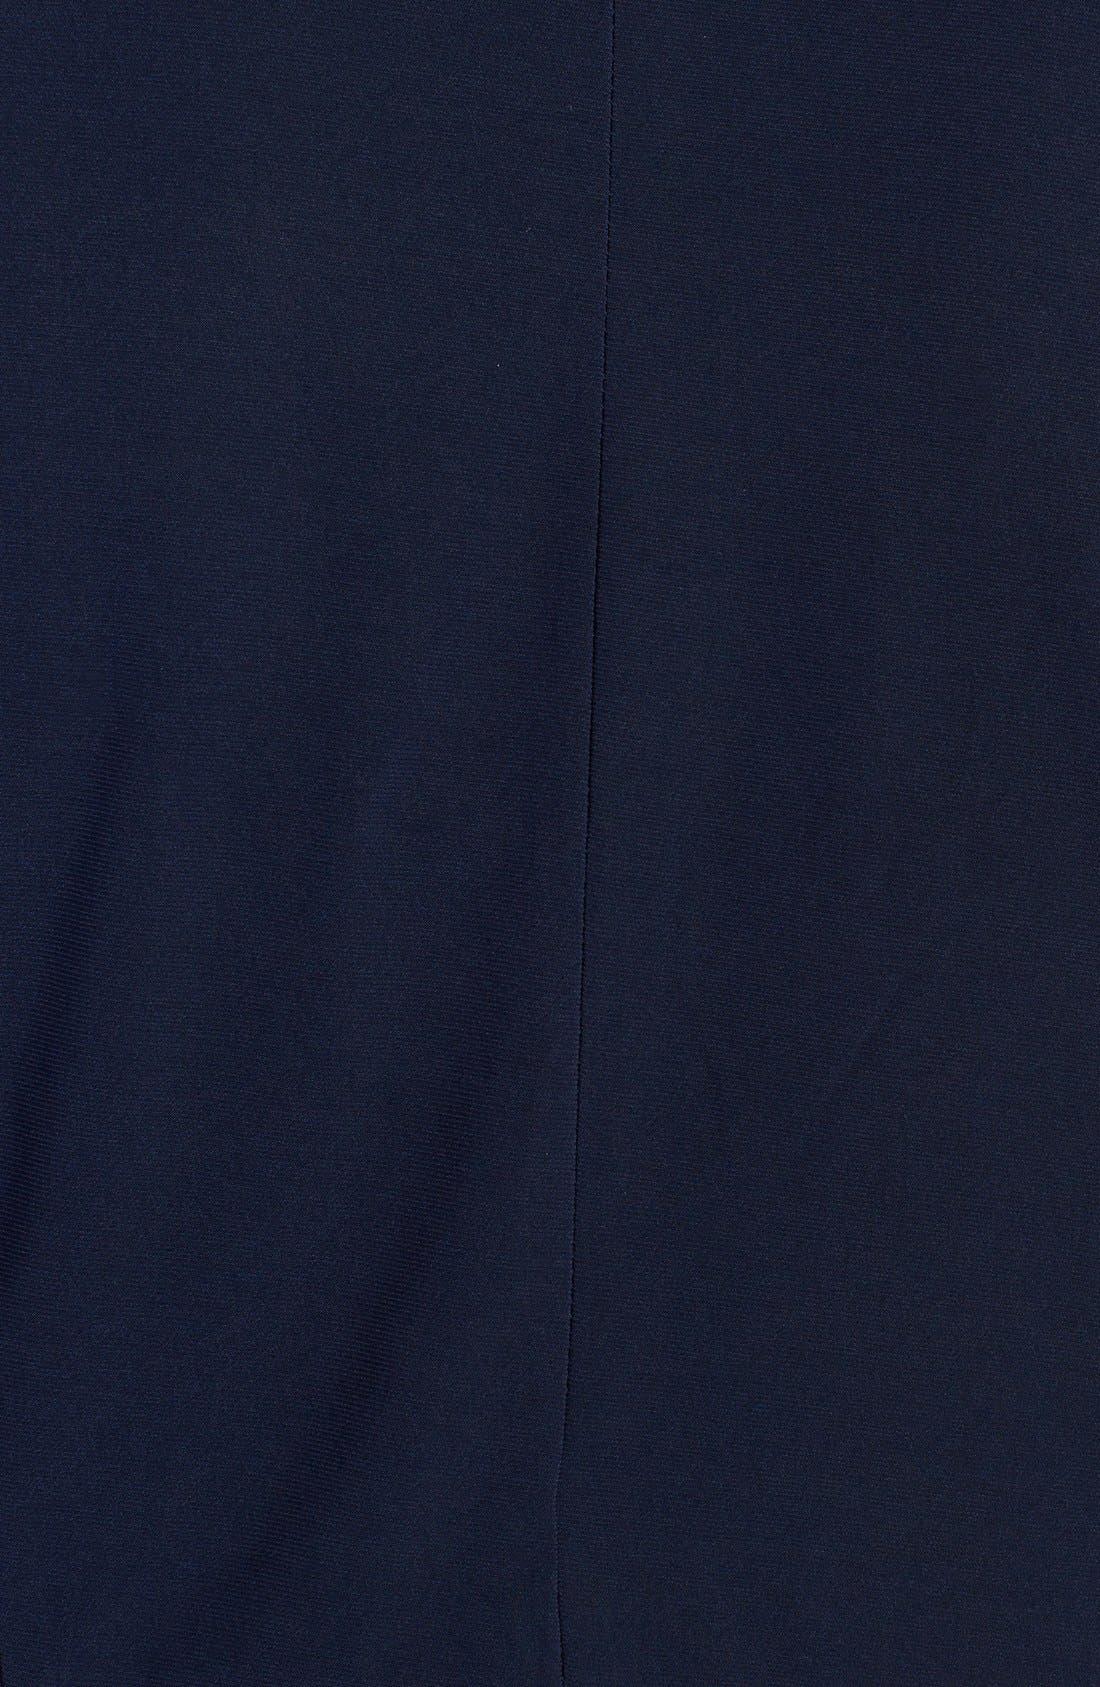 Alternate Image 3  - Jessica Howard Embellished Waist Artichoke Pleat Gown & Jacket (Plus Size)